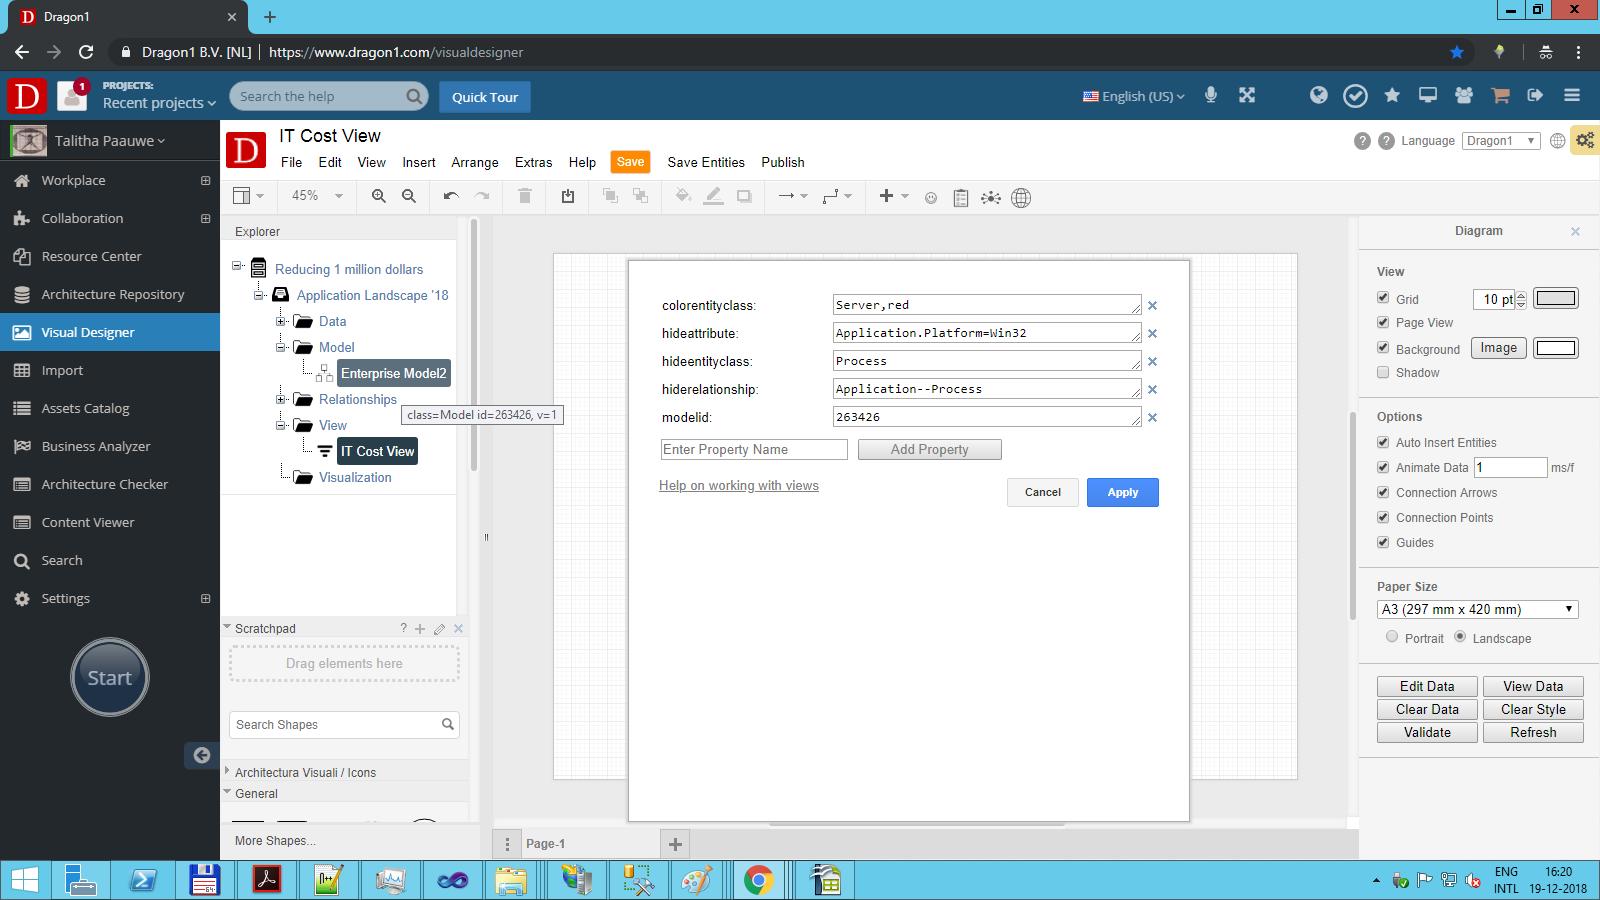 screenshot view data setup visual designer